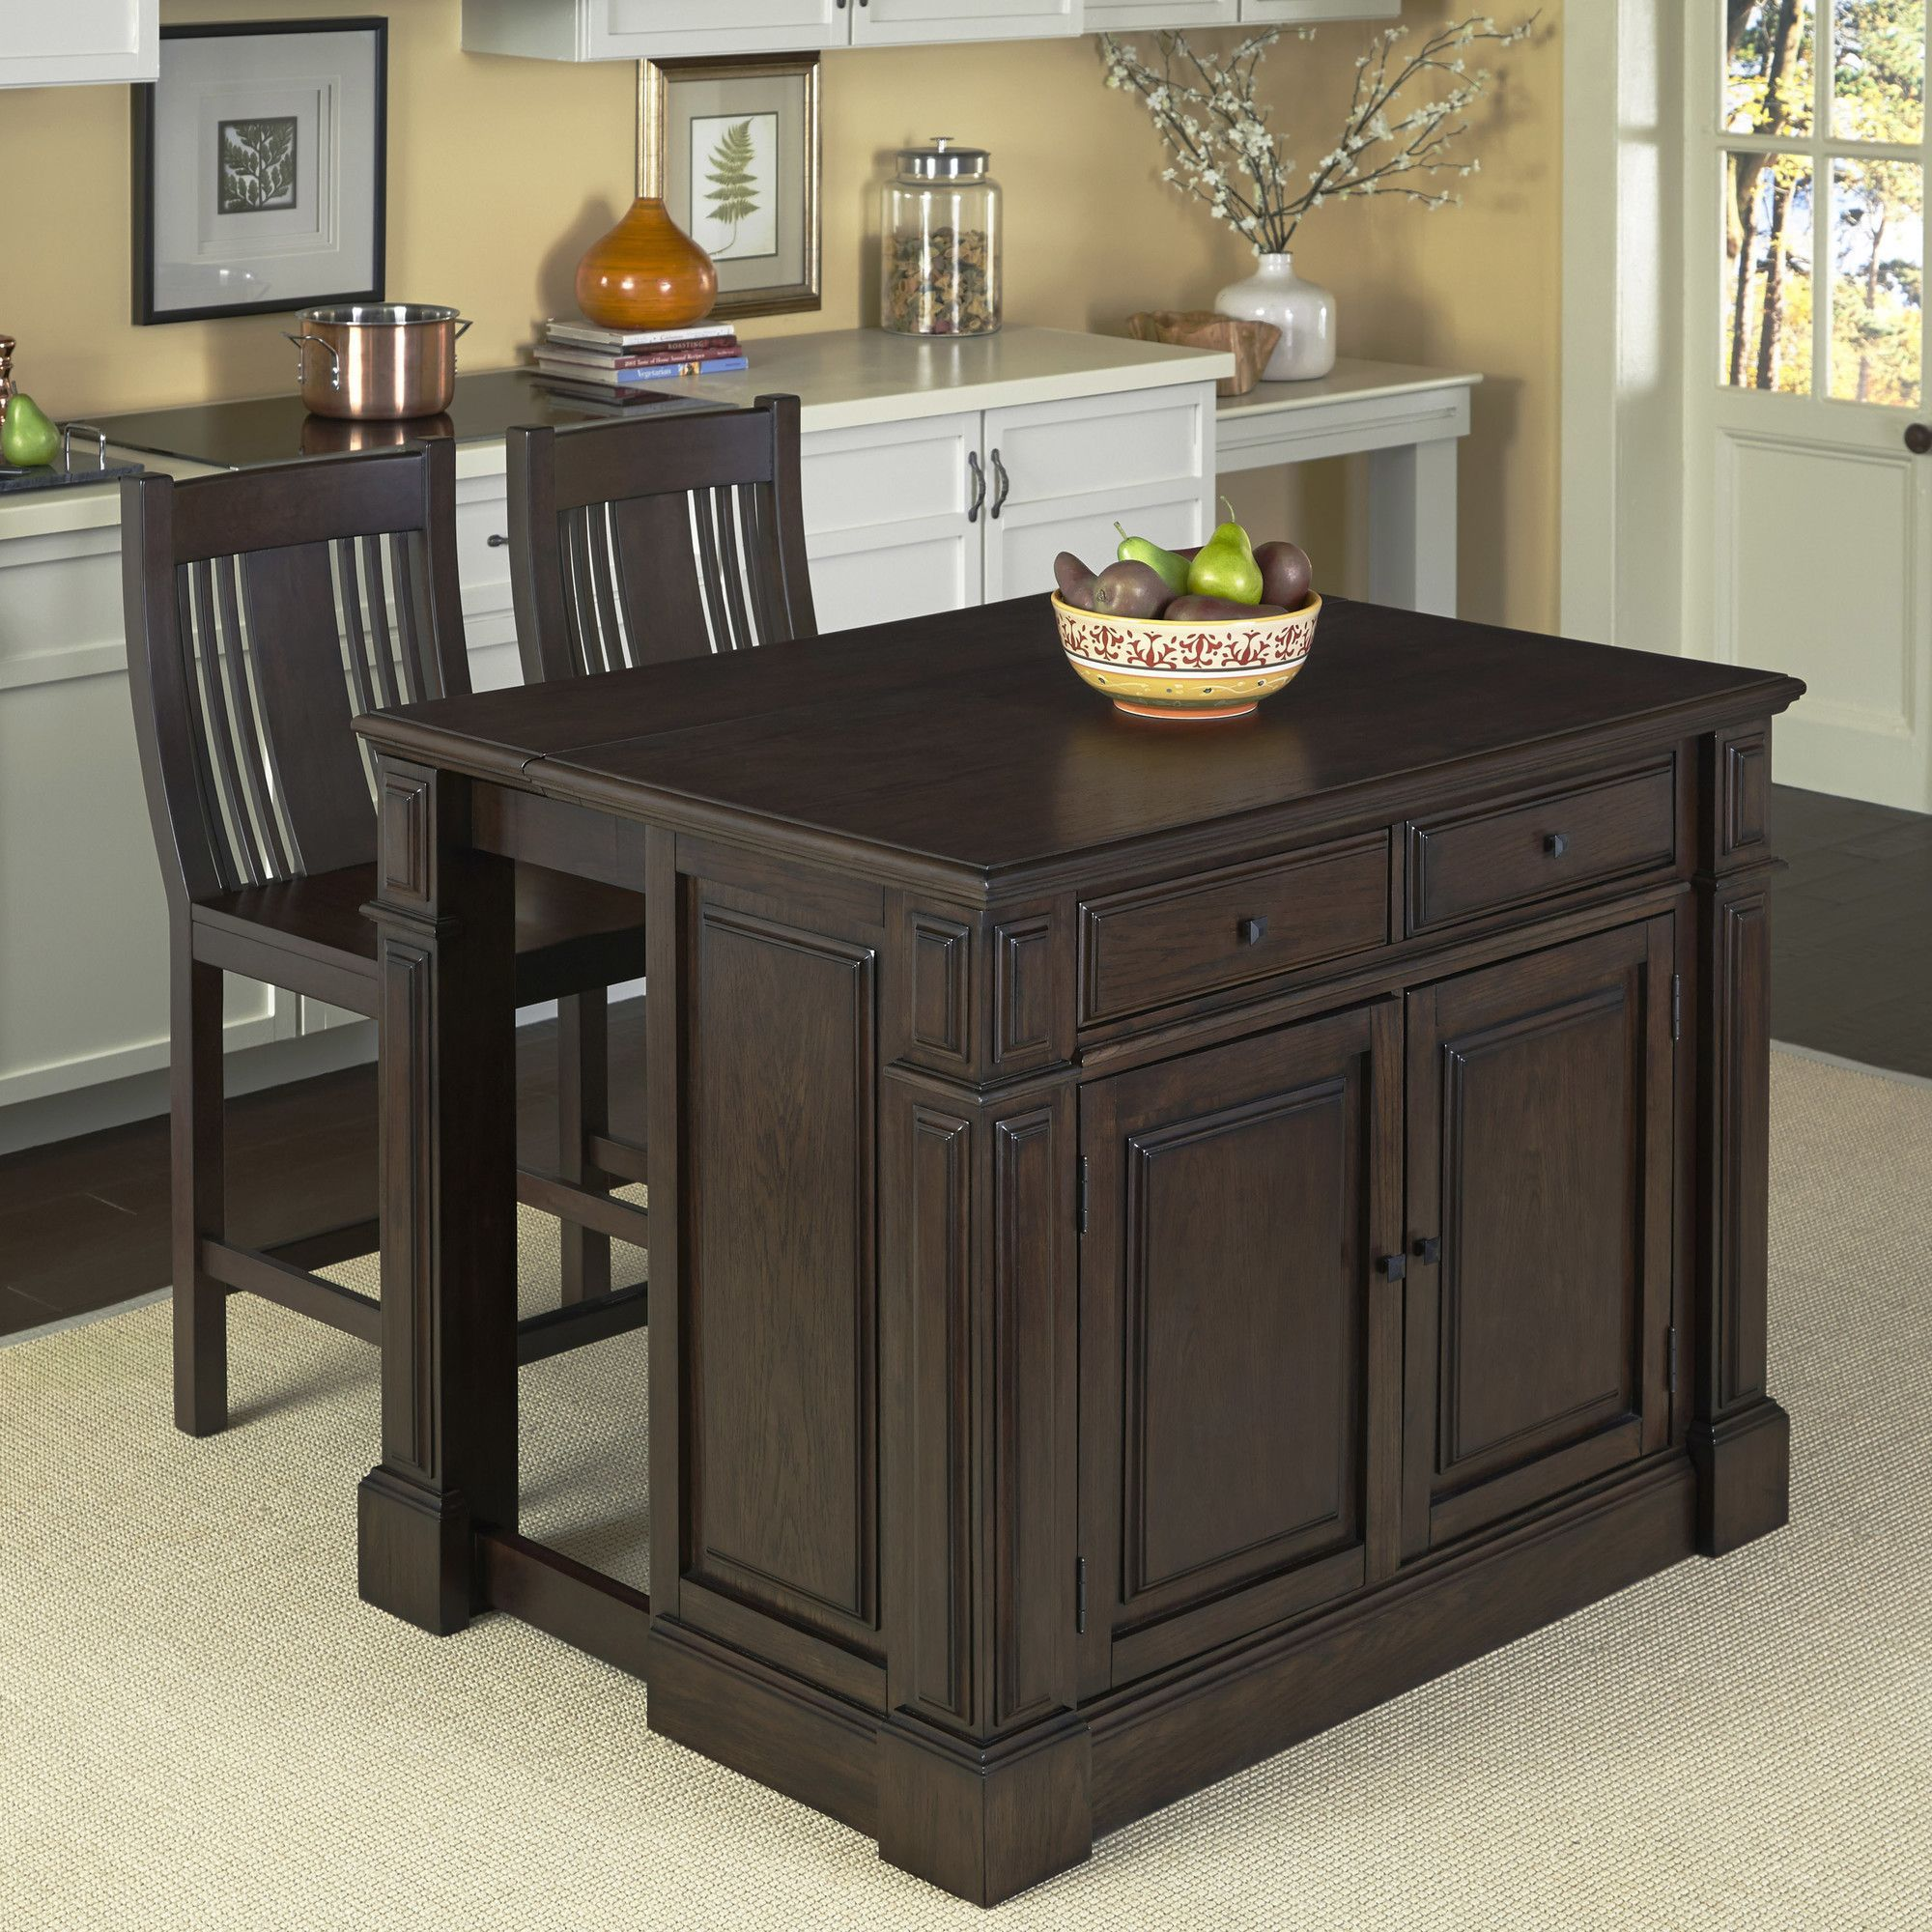 Home Styles Prairie Home 3 Piece Kitchen Island Set Set Of 3 Kitchen Island With Bench Seating Kitchen Island With Seating Eclectic Kitchen